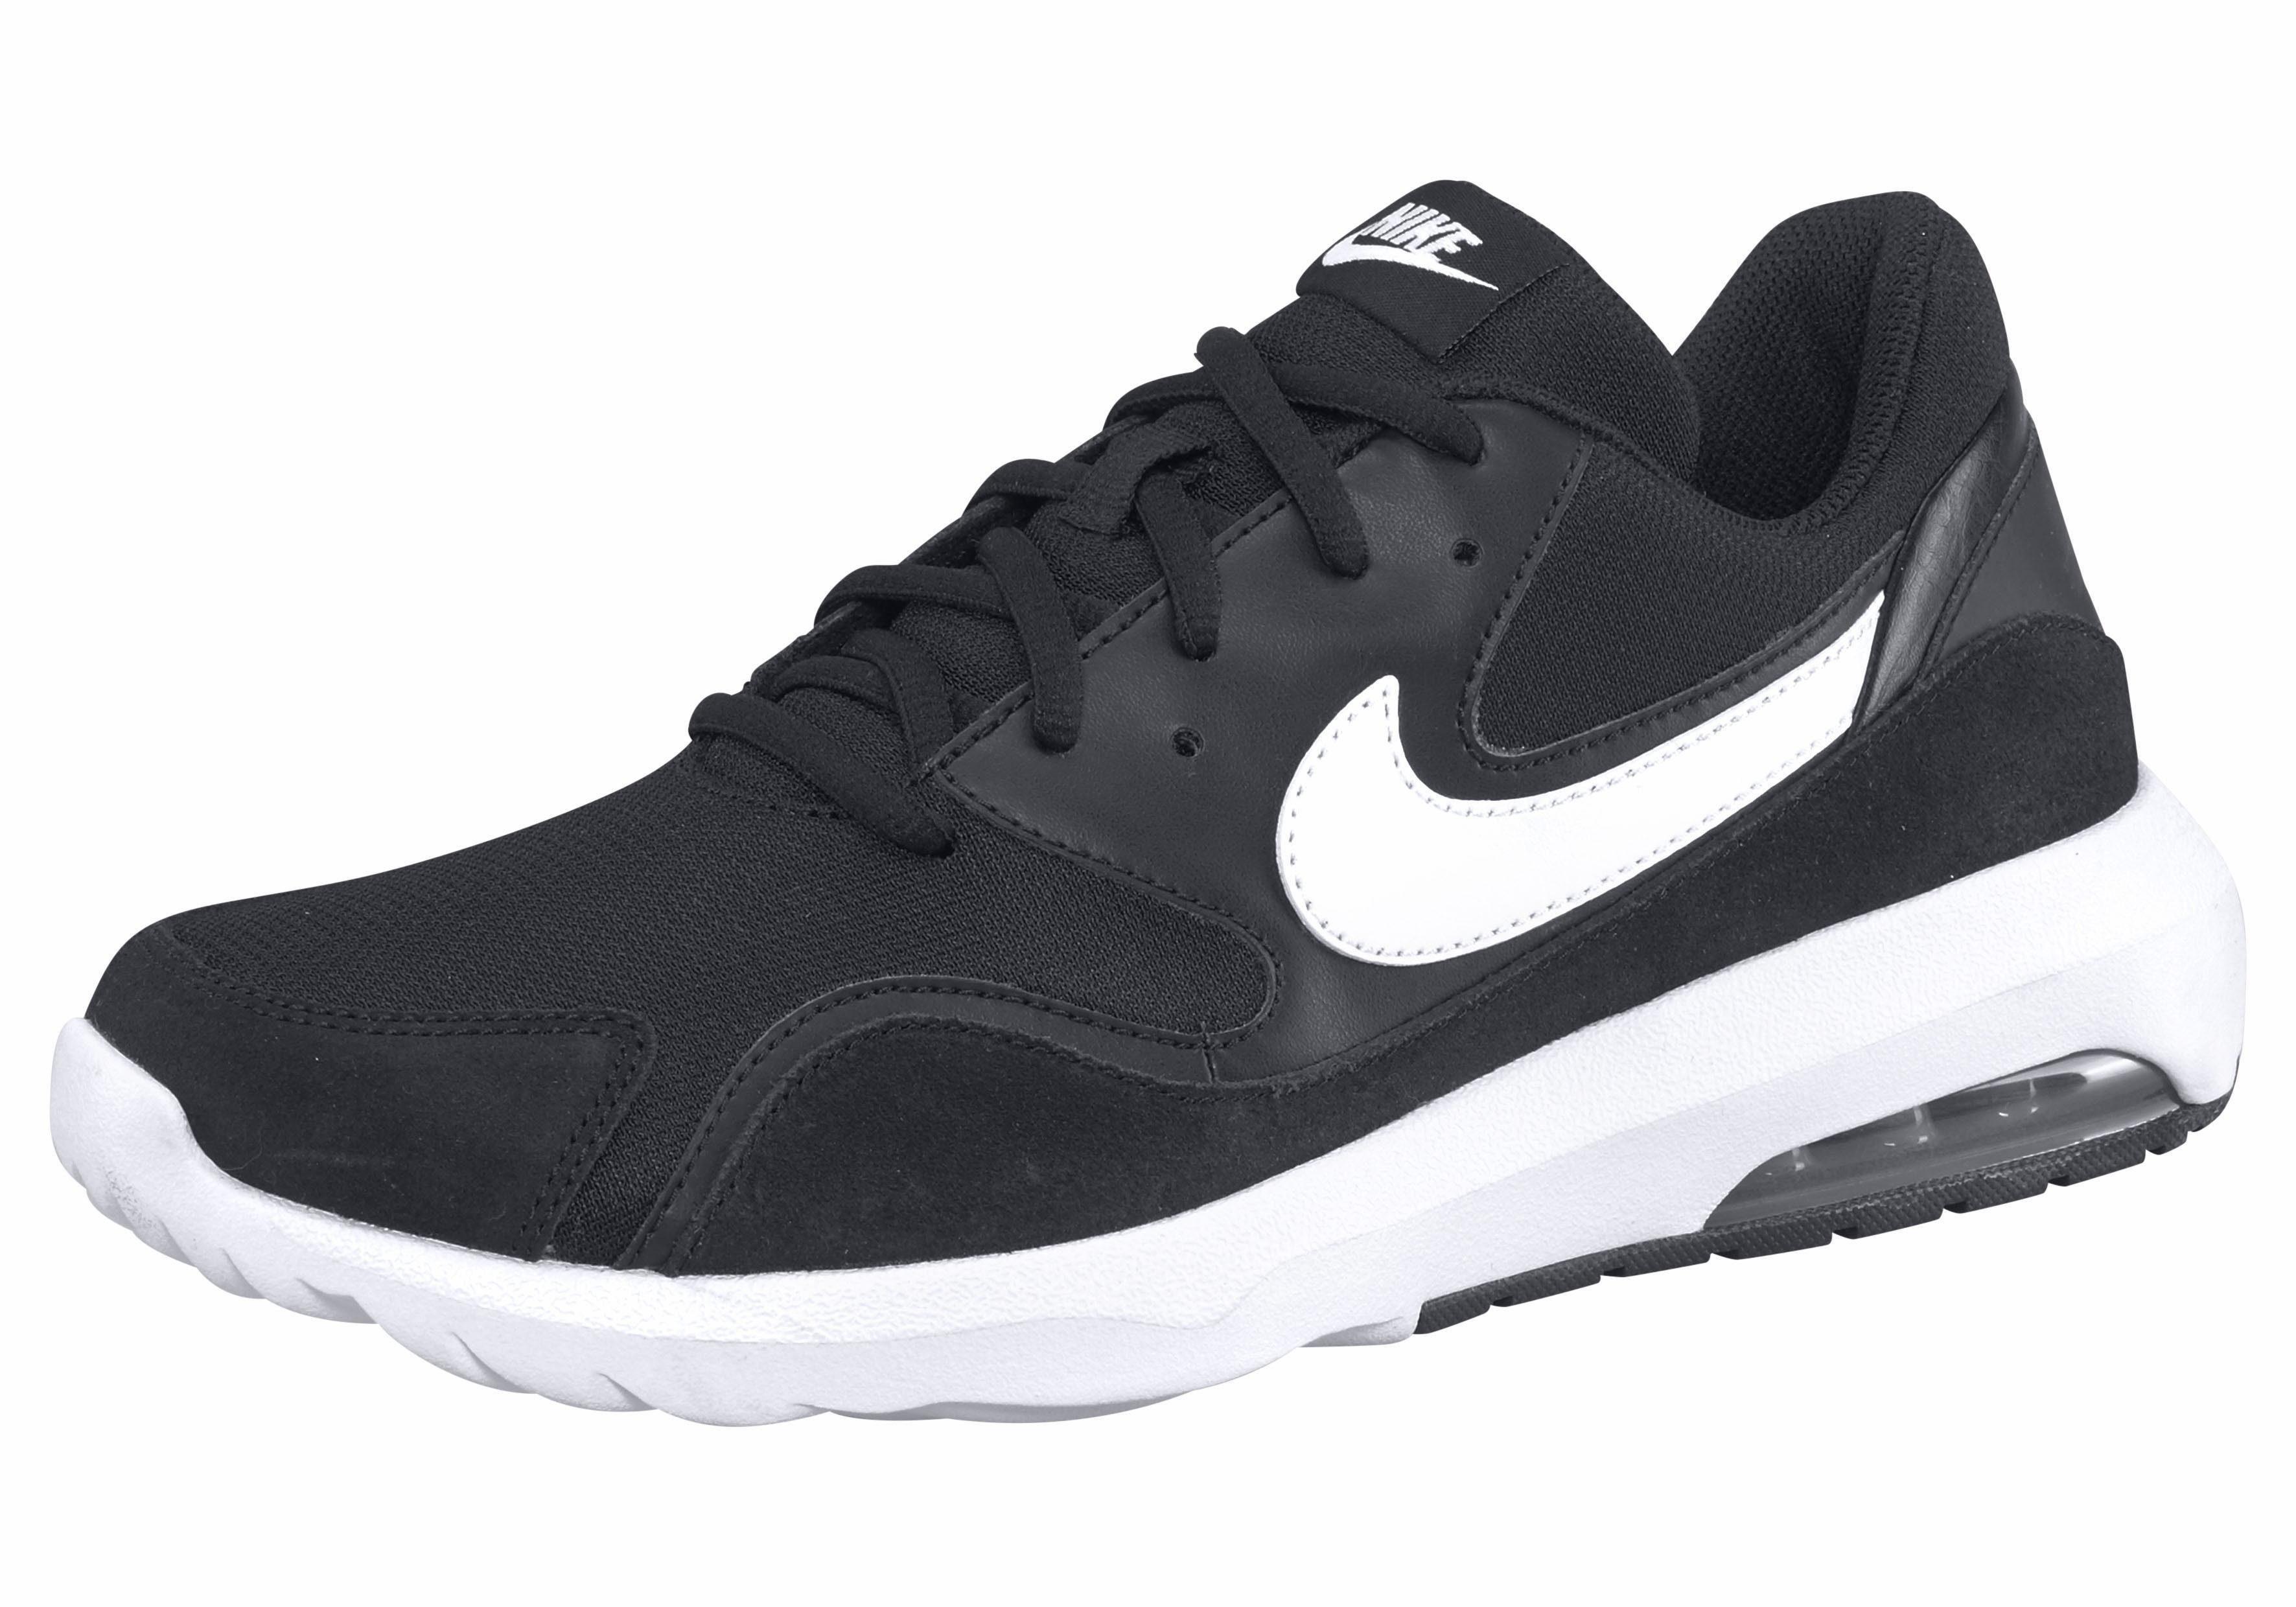 Nike Sneakers Couche Noire Occasionnels « Nostalgique Air Max ' hhxVA6